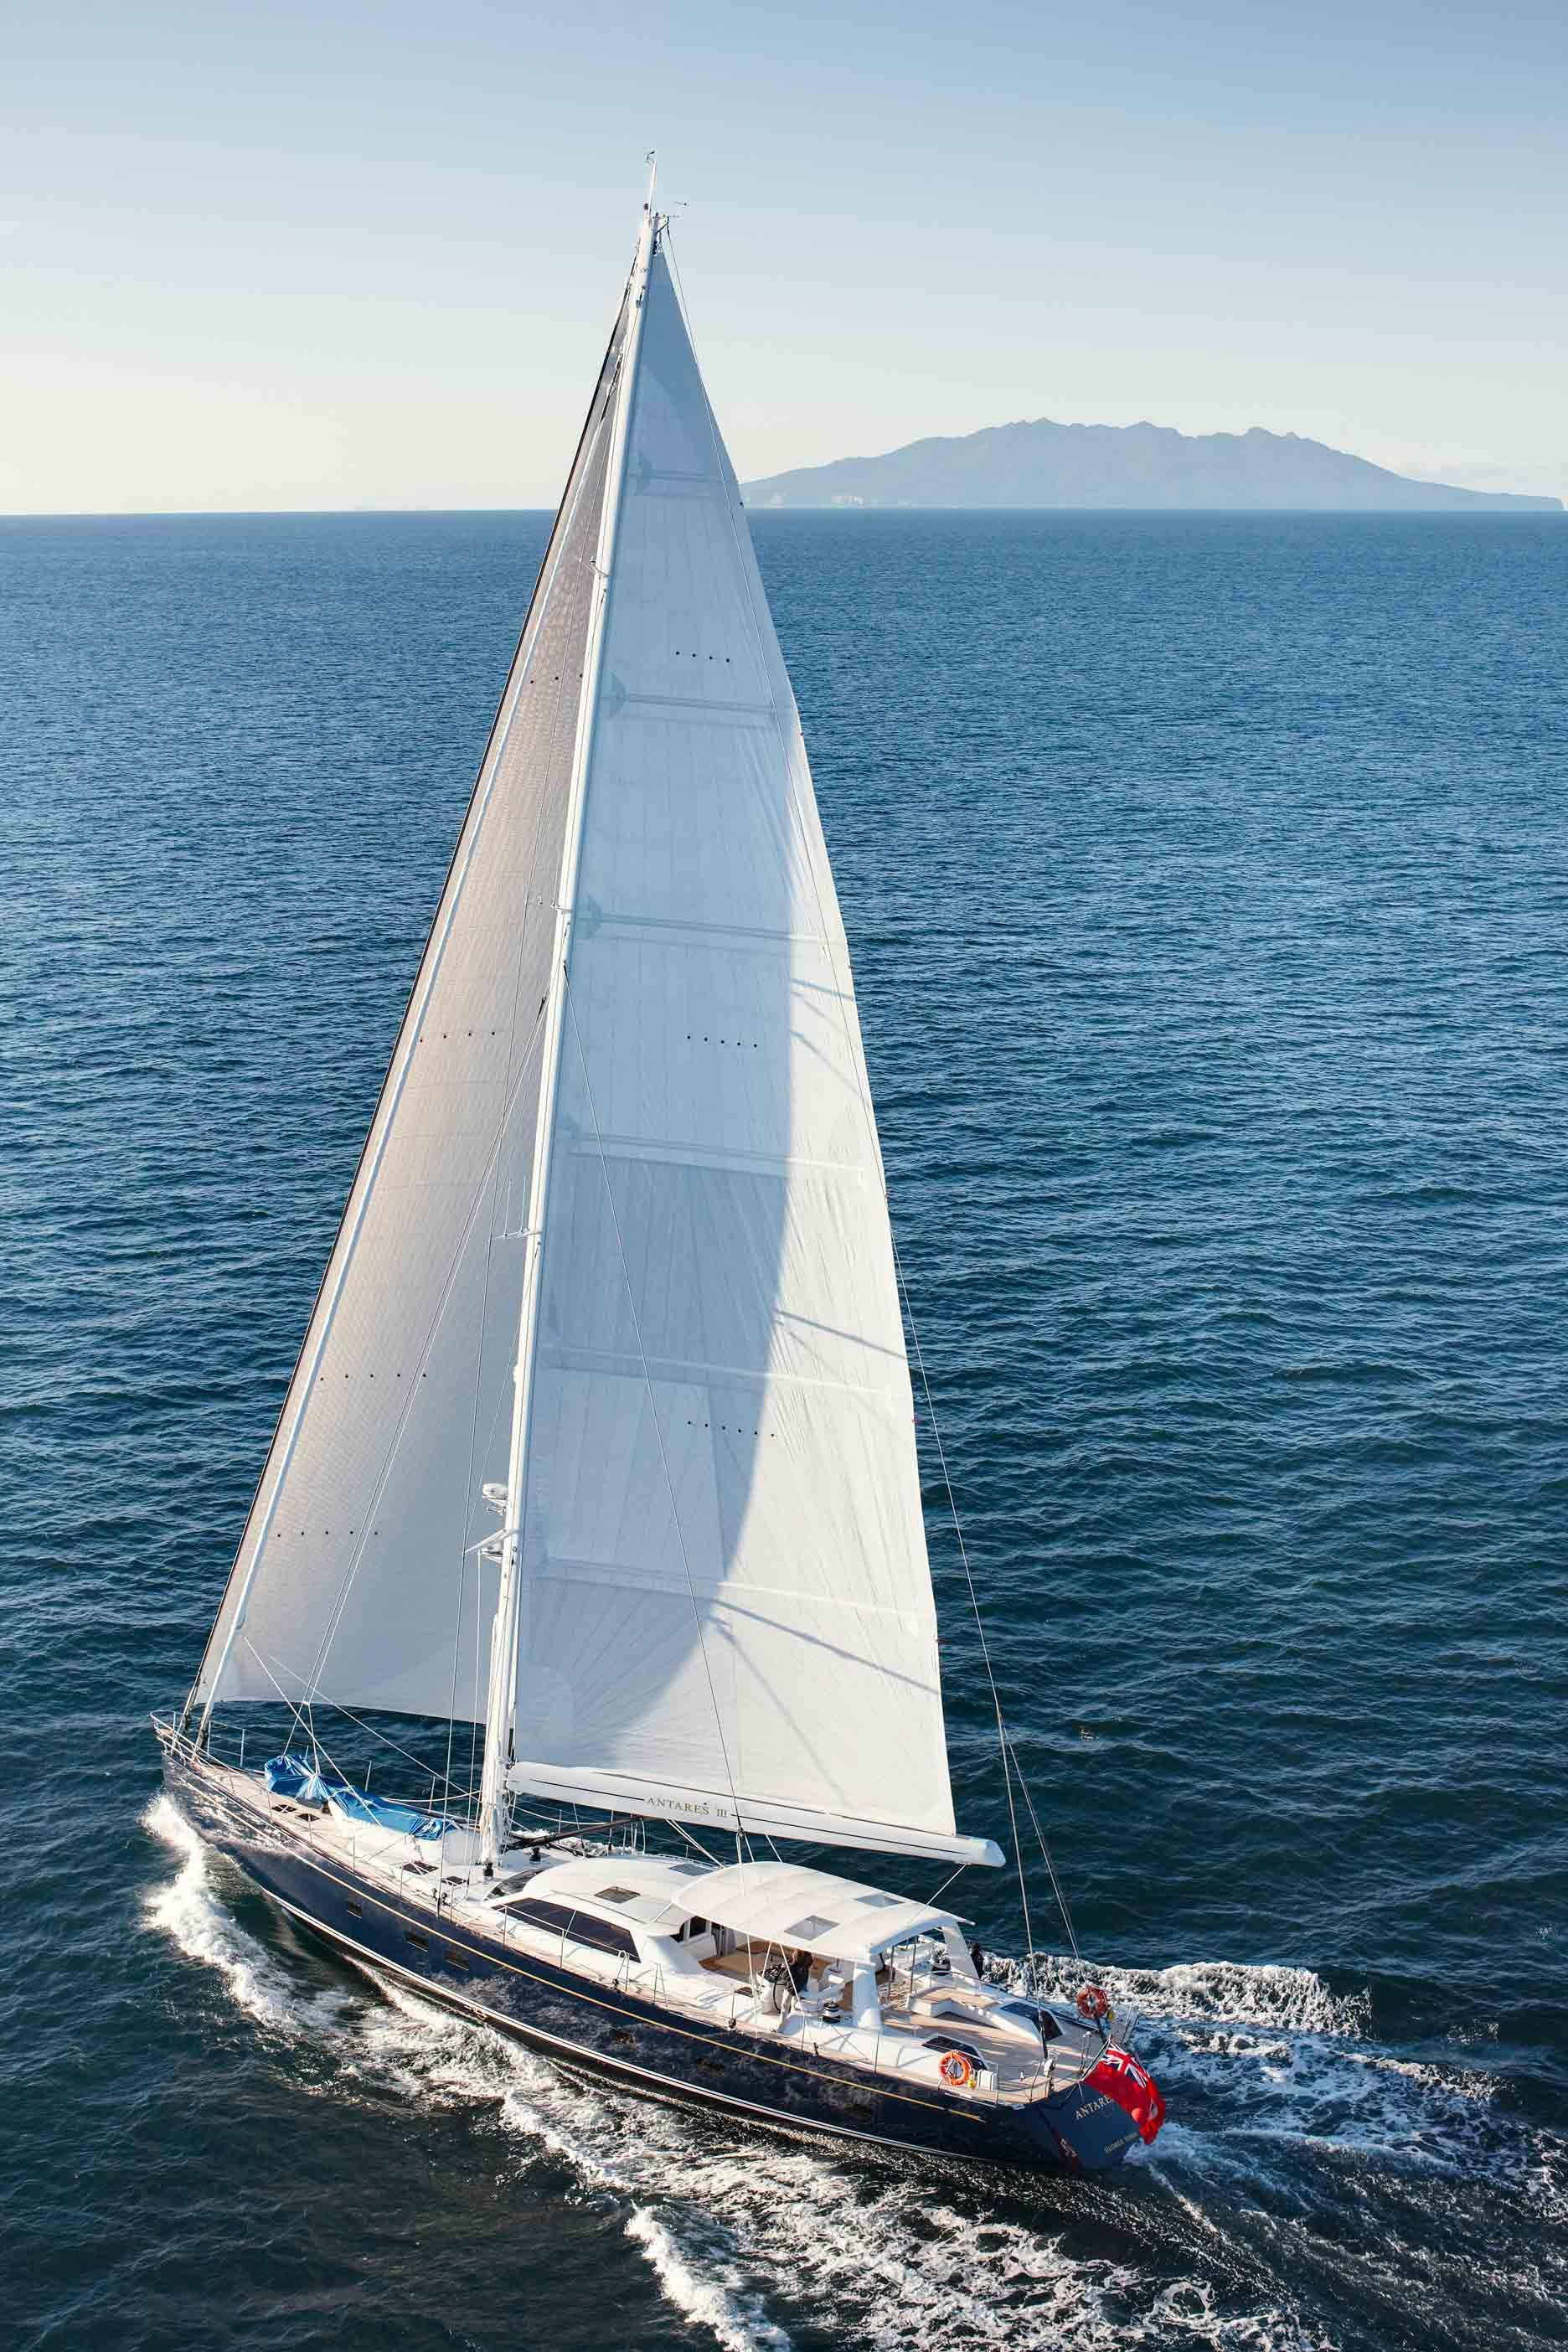 Image Detail For Sailing Yacht Antares Iii Sailing